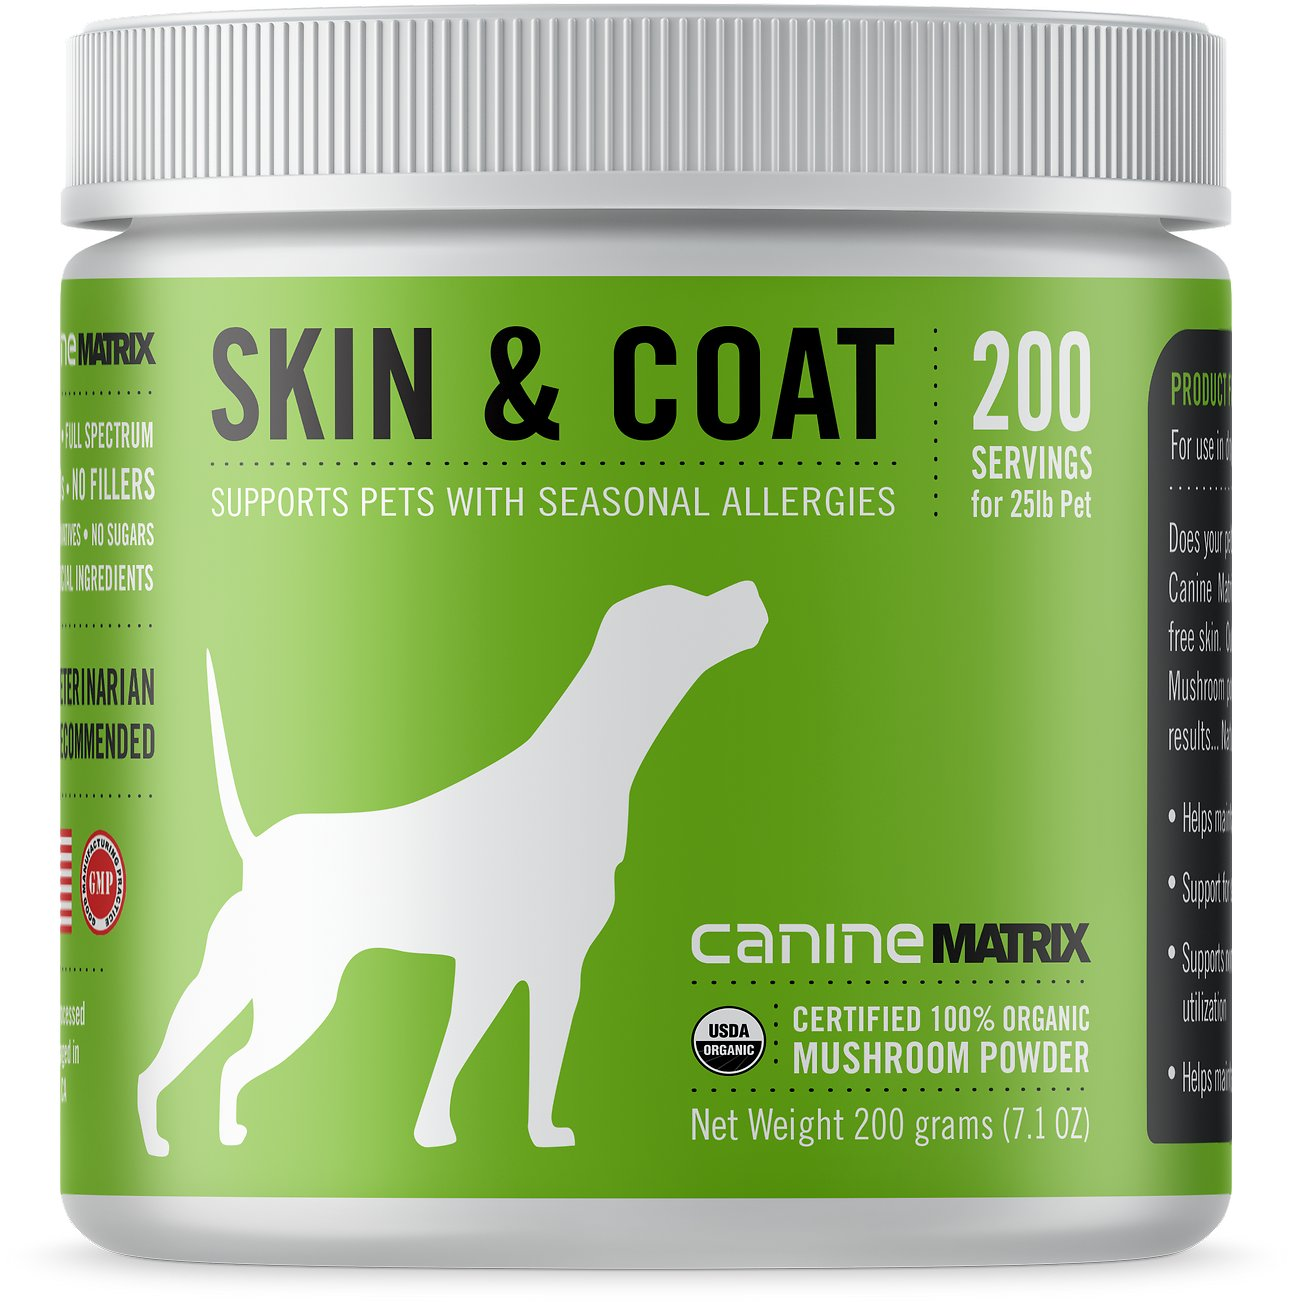 Canine Matrix Skin & Coat Seasonal Allergies Dog Supplement, 200-g